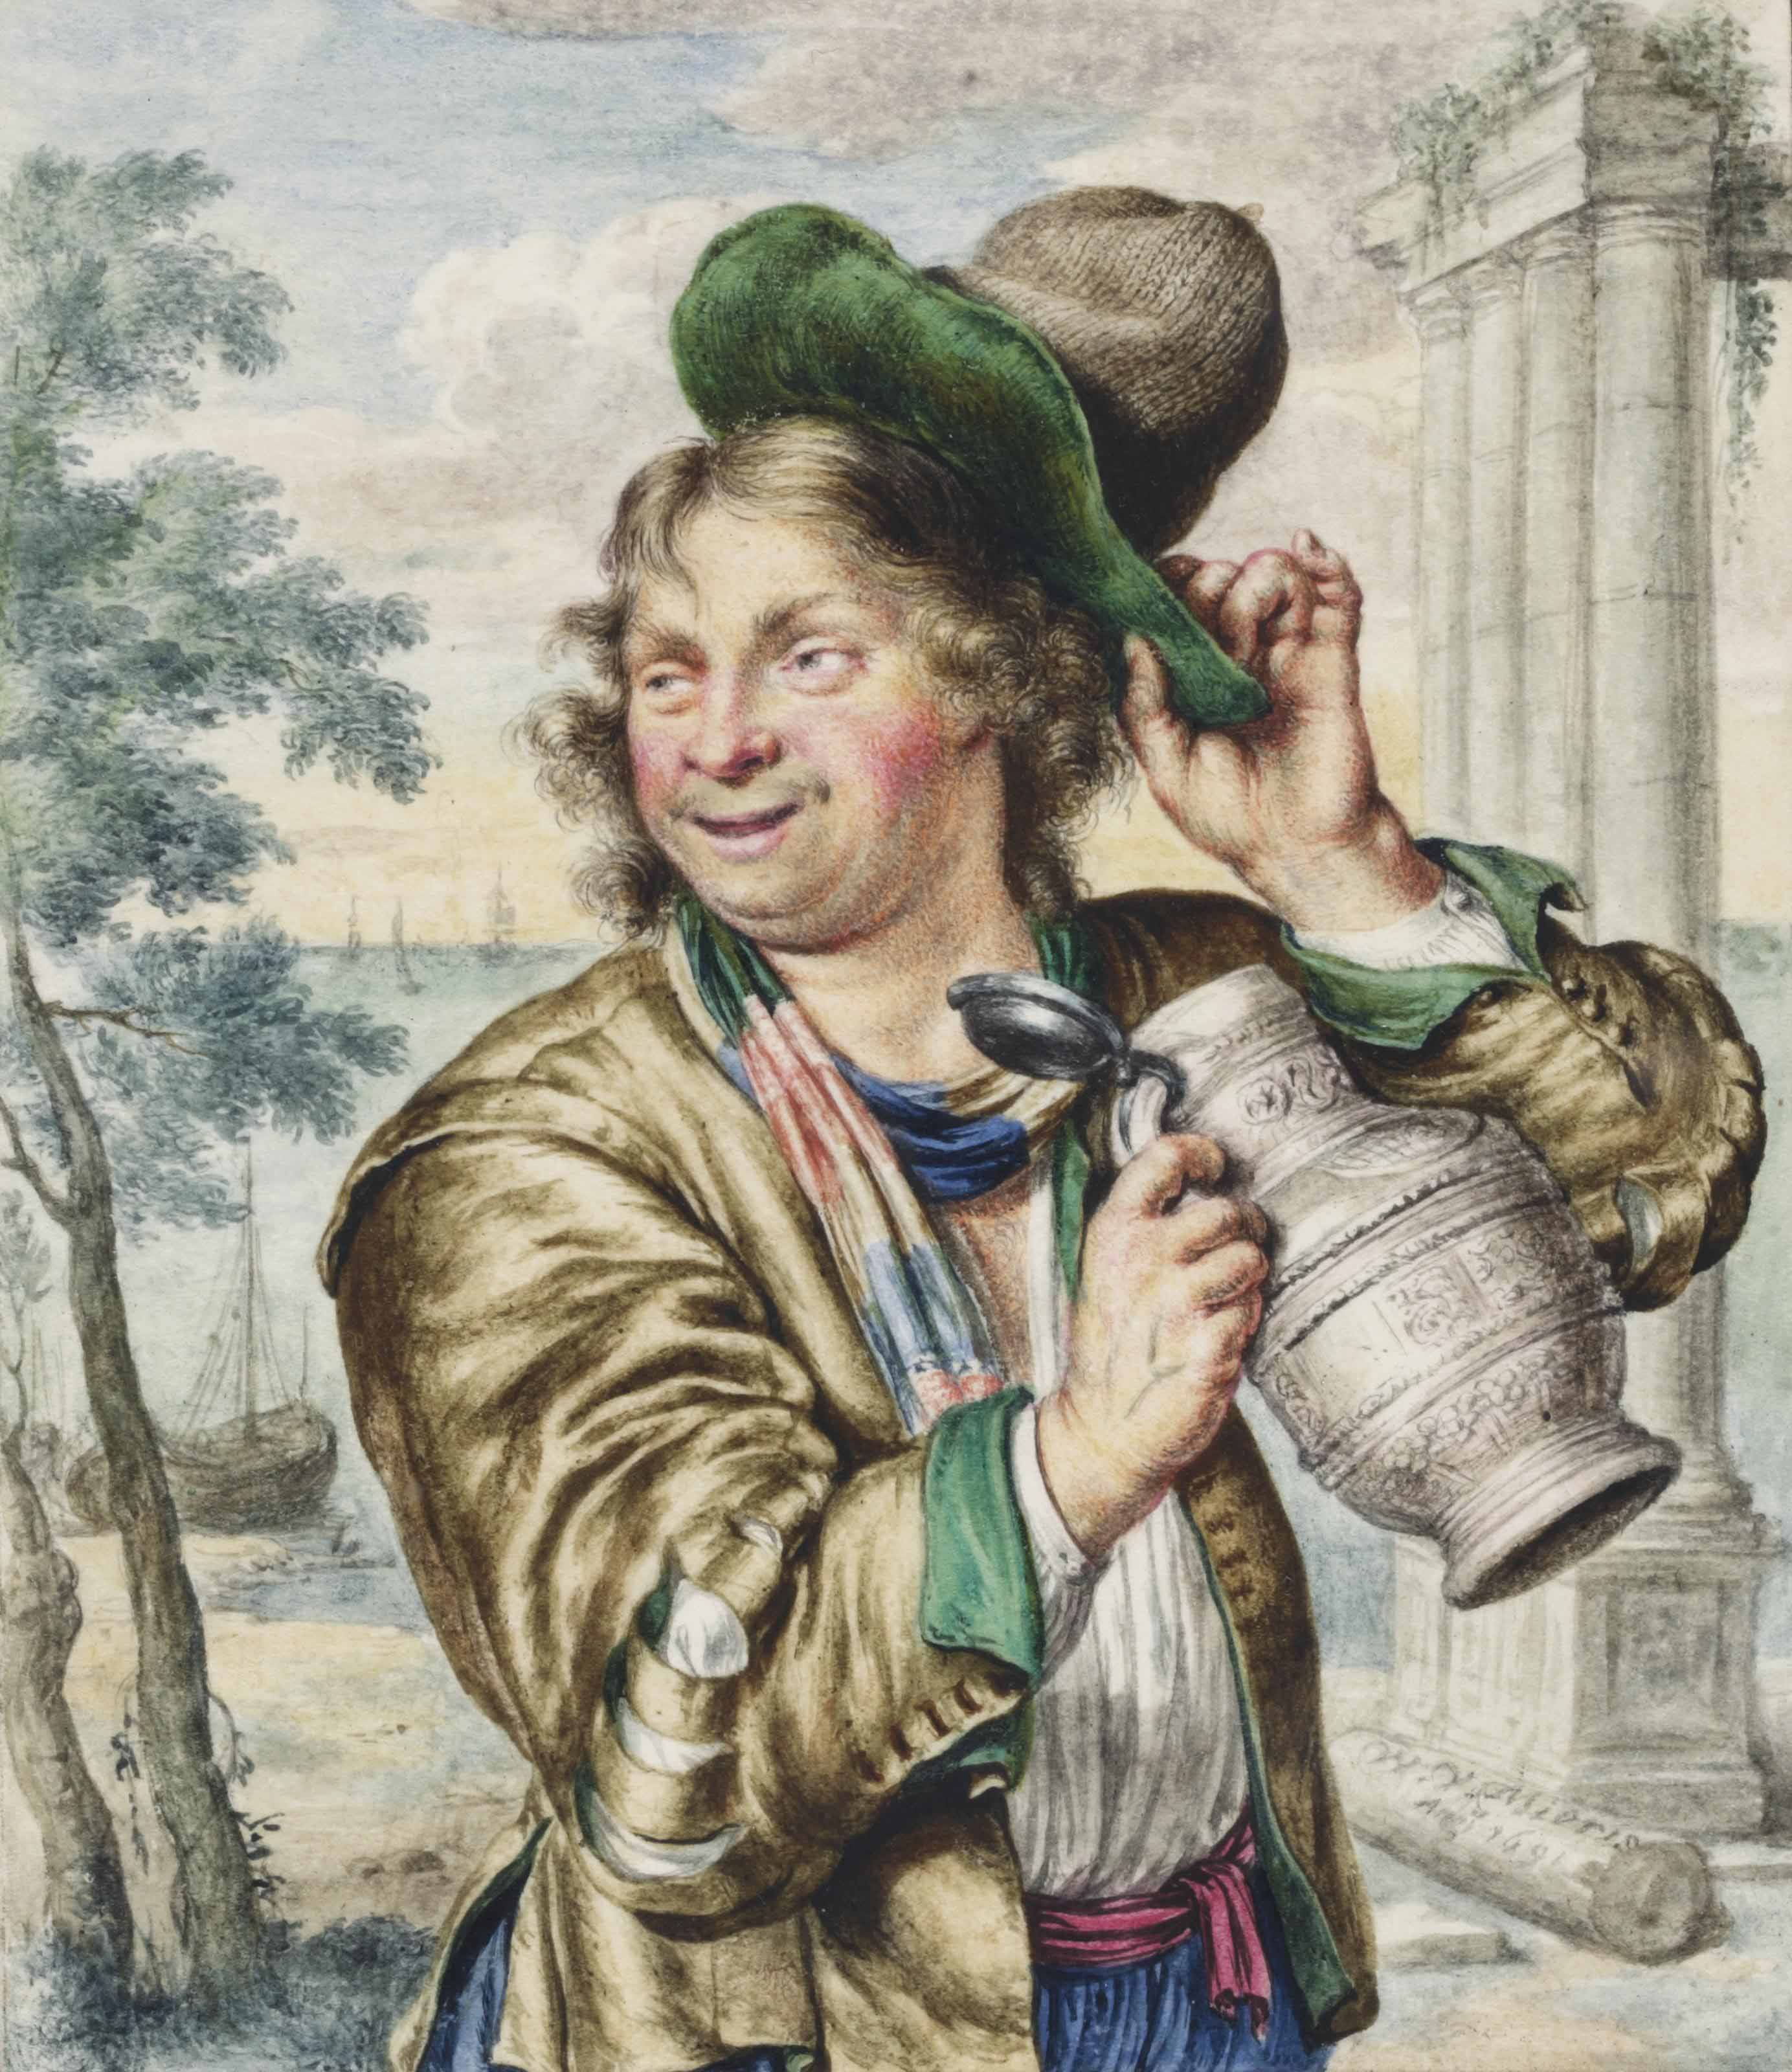 A man holding a tankard